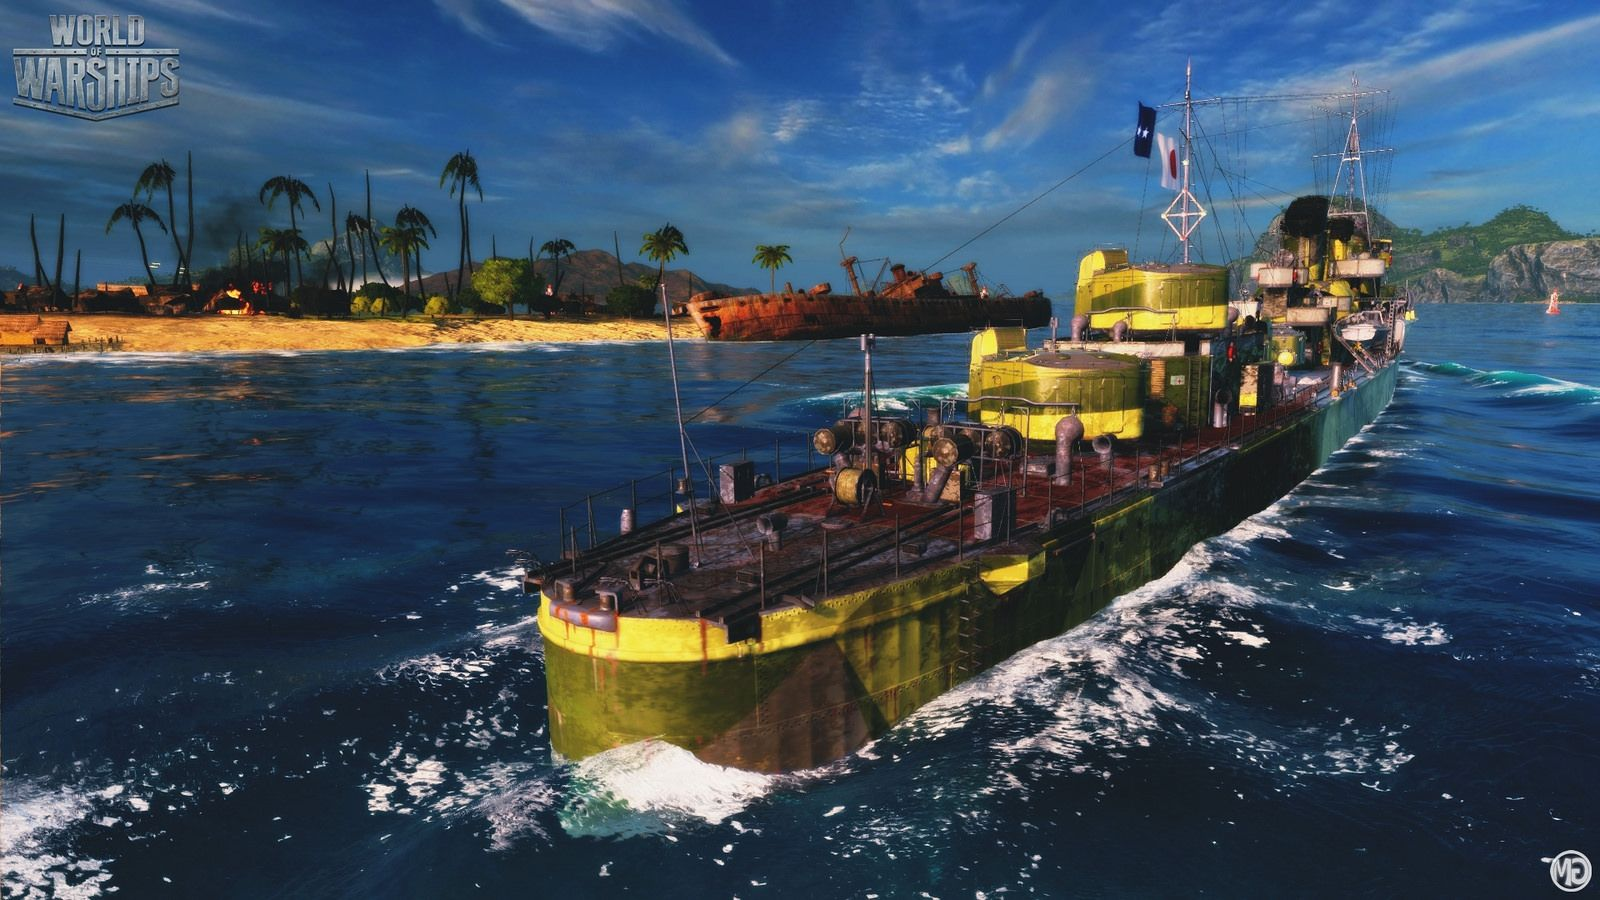 World Of Warships Wallpaper 1080p World Of Warships Wallpaper